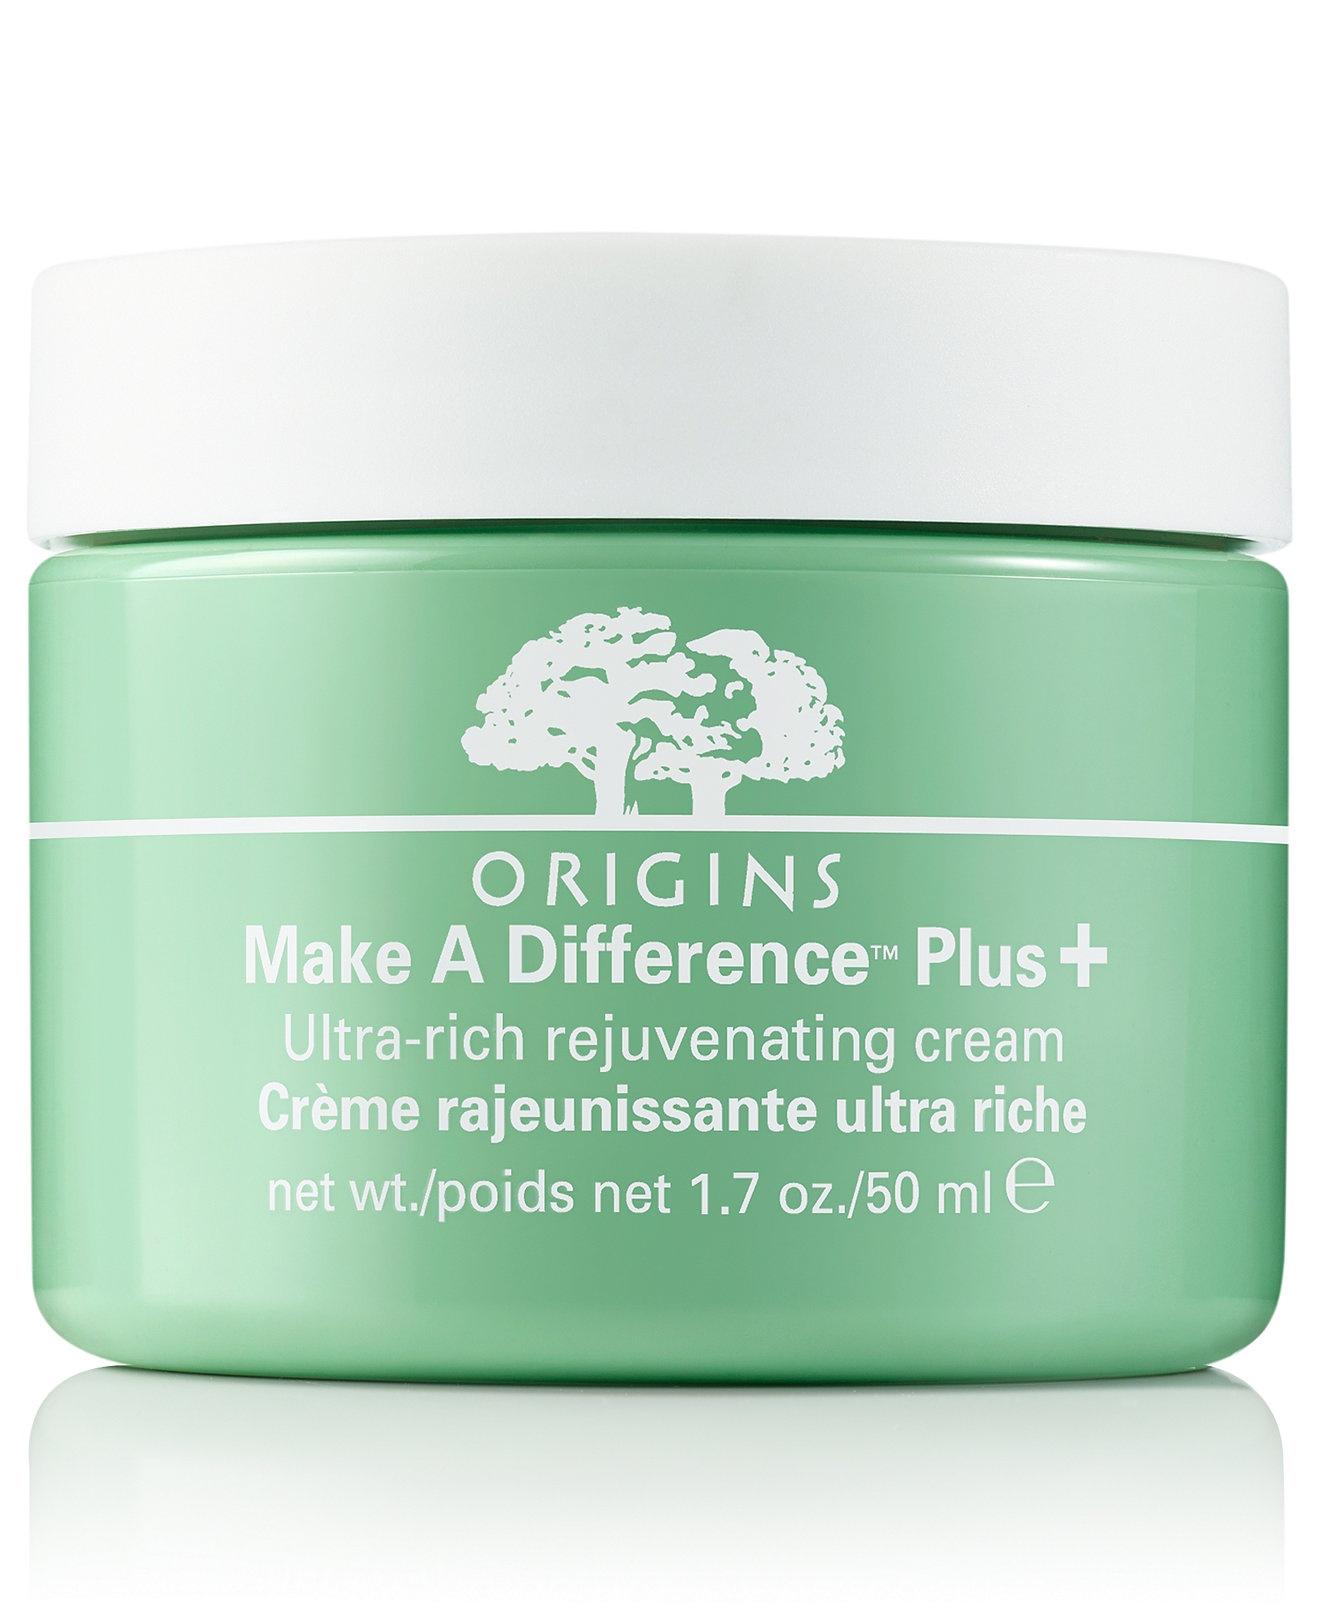 Origins Make A Difference Plus+ Ultra-Rich Rejuvenating Cream, 50 ml